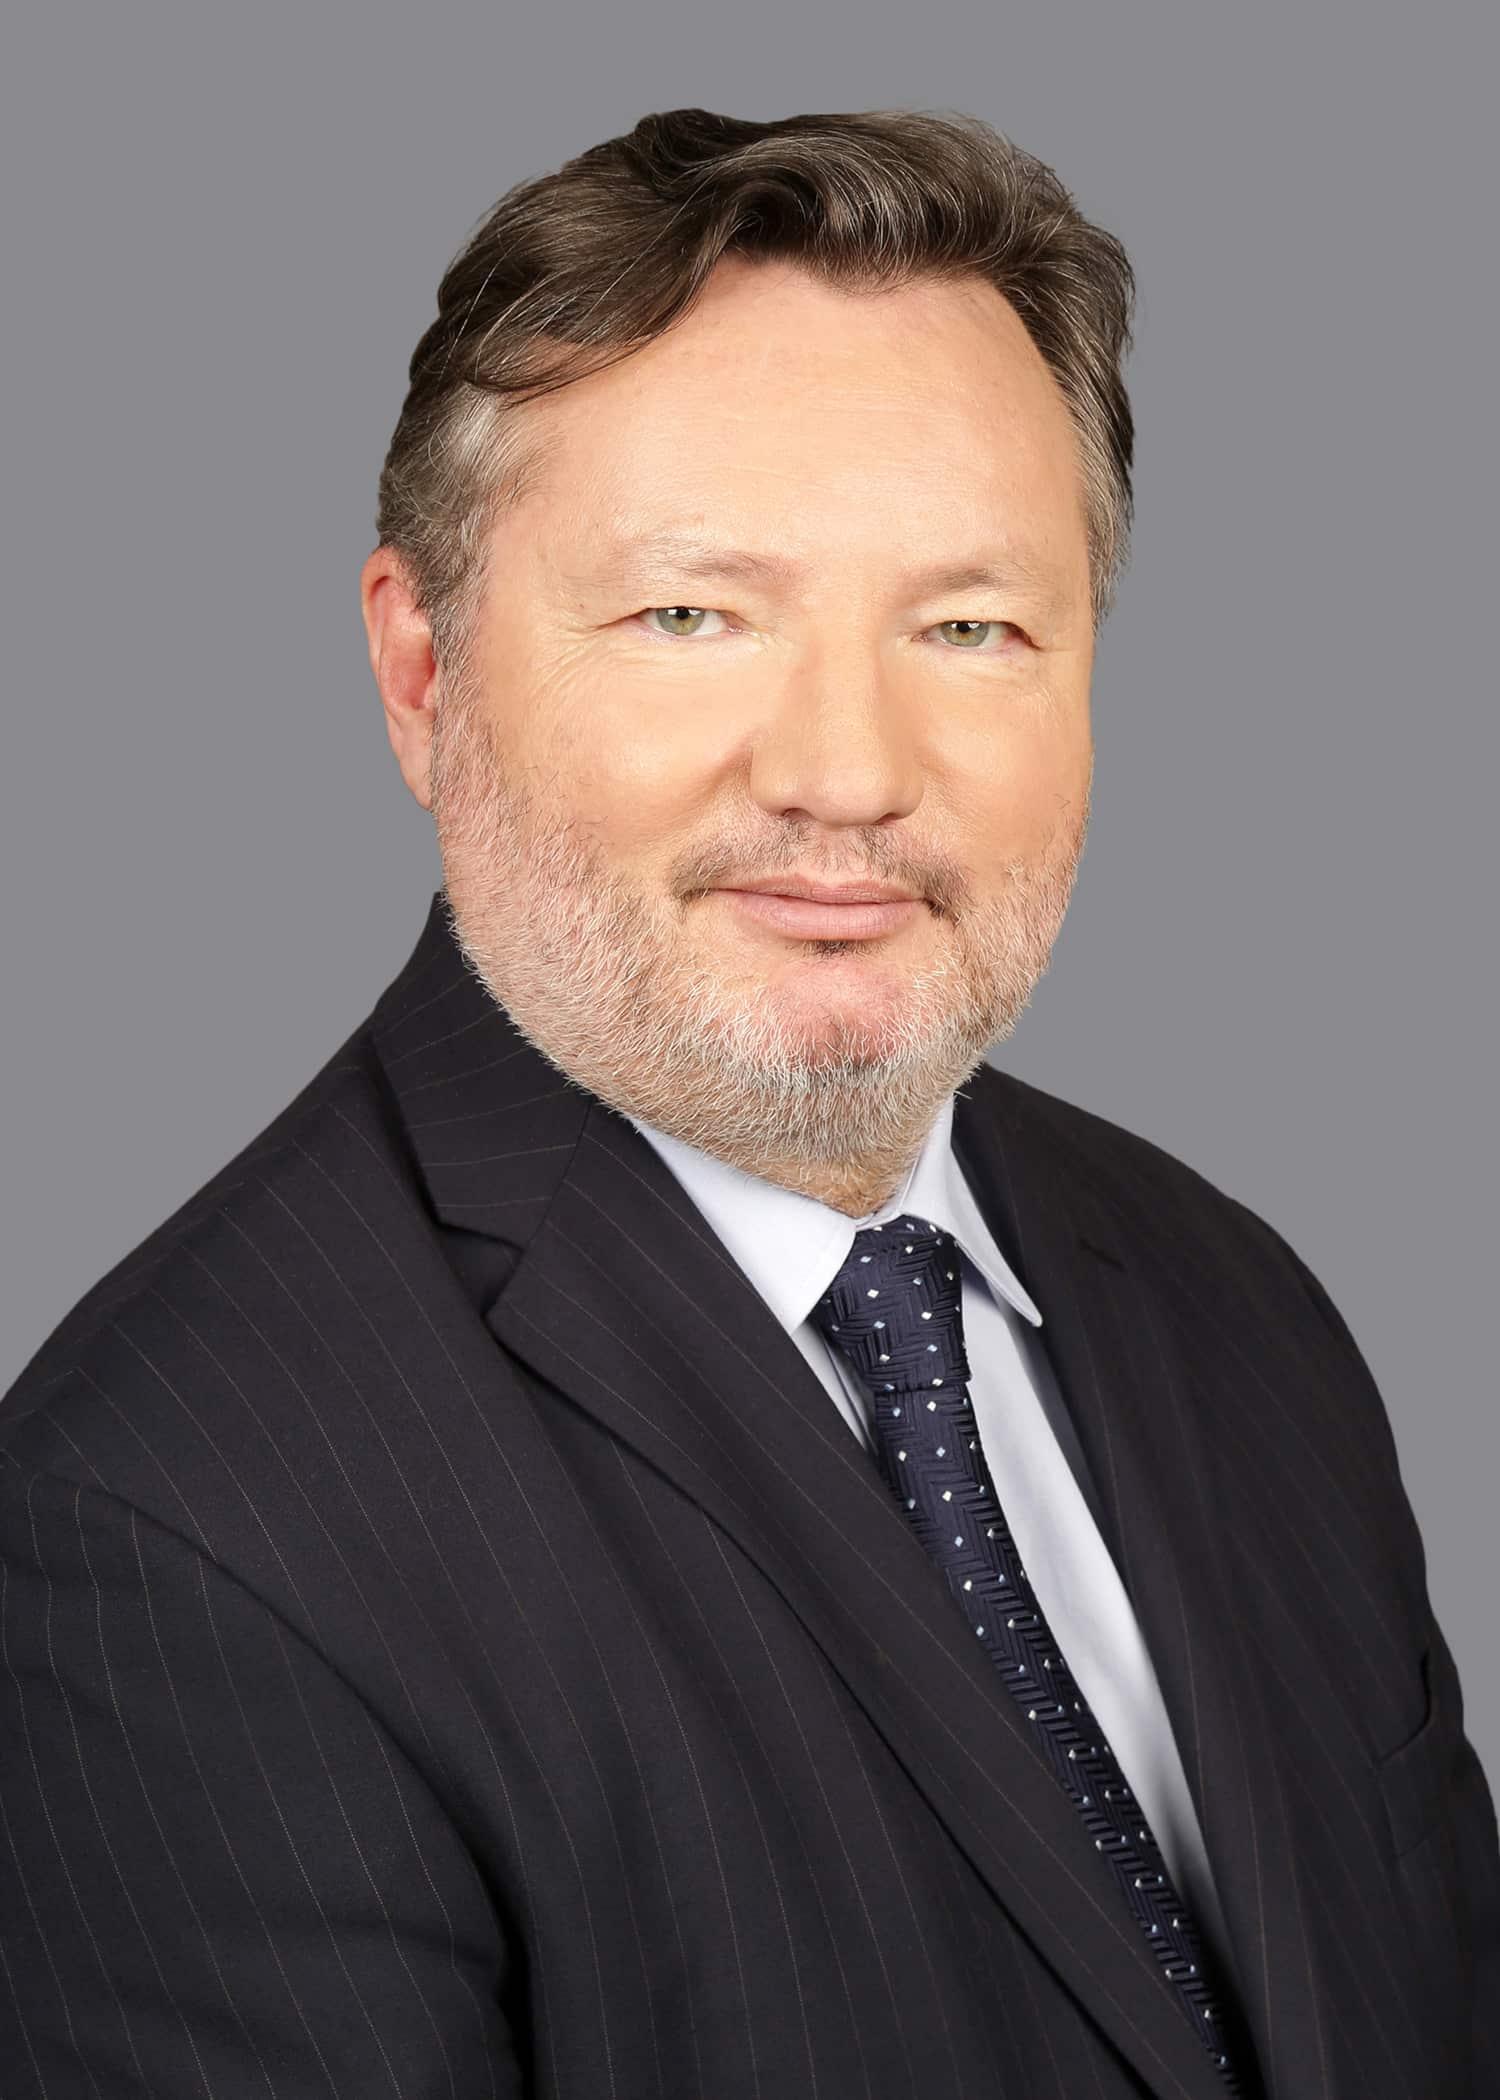 Jean-Philippe Robé